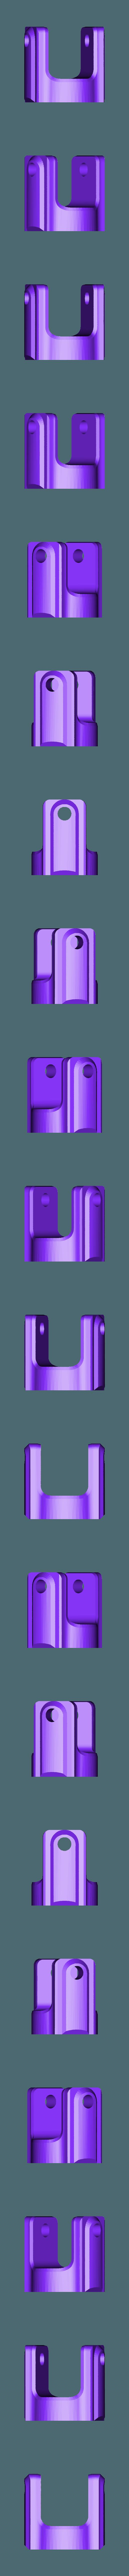 TruckV3_Axle_rear_shaft_Ujoint_A.STL Download STL file 3D Printed RC Truck V3 • 3D print model, MrCrankyface